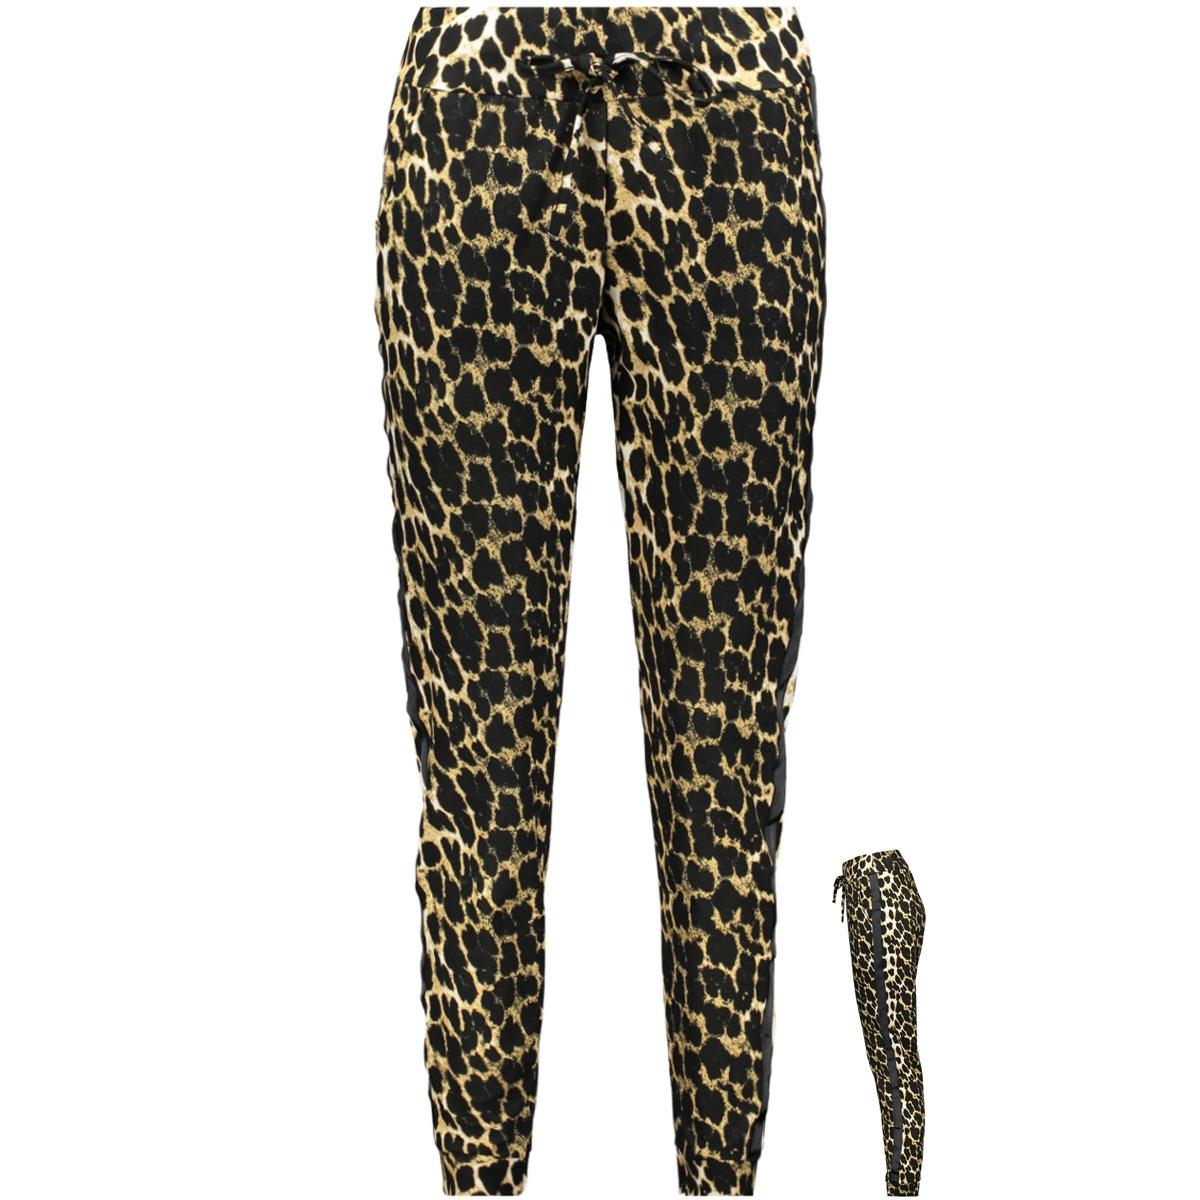 3334 pant iz naiz broek leopard